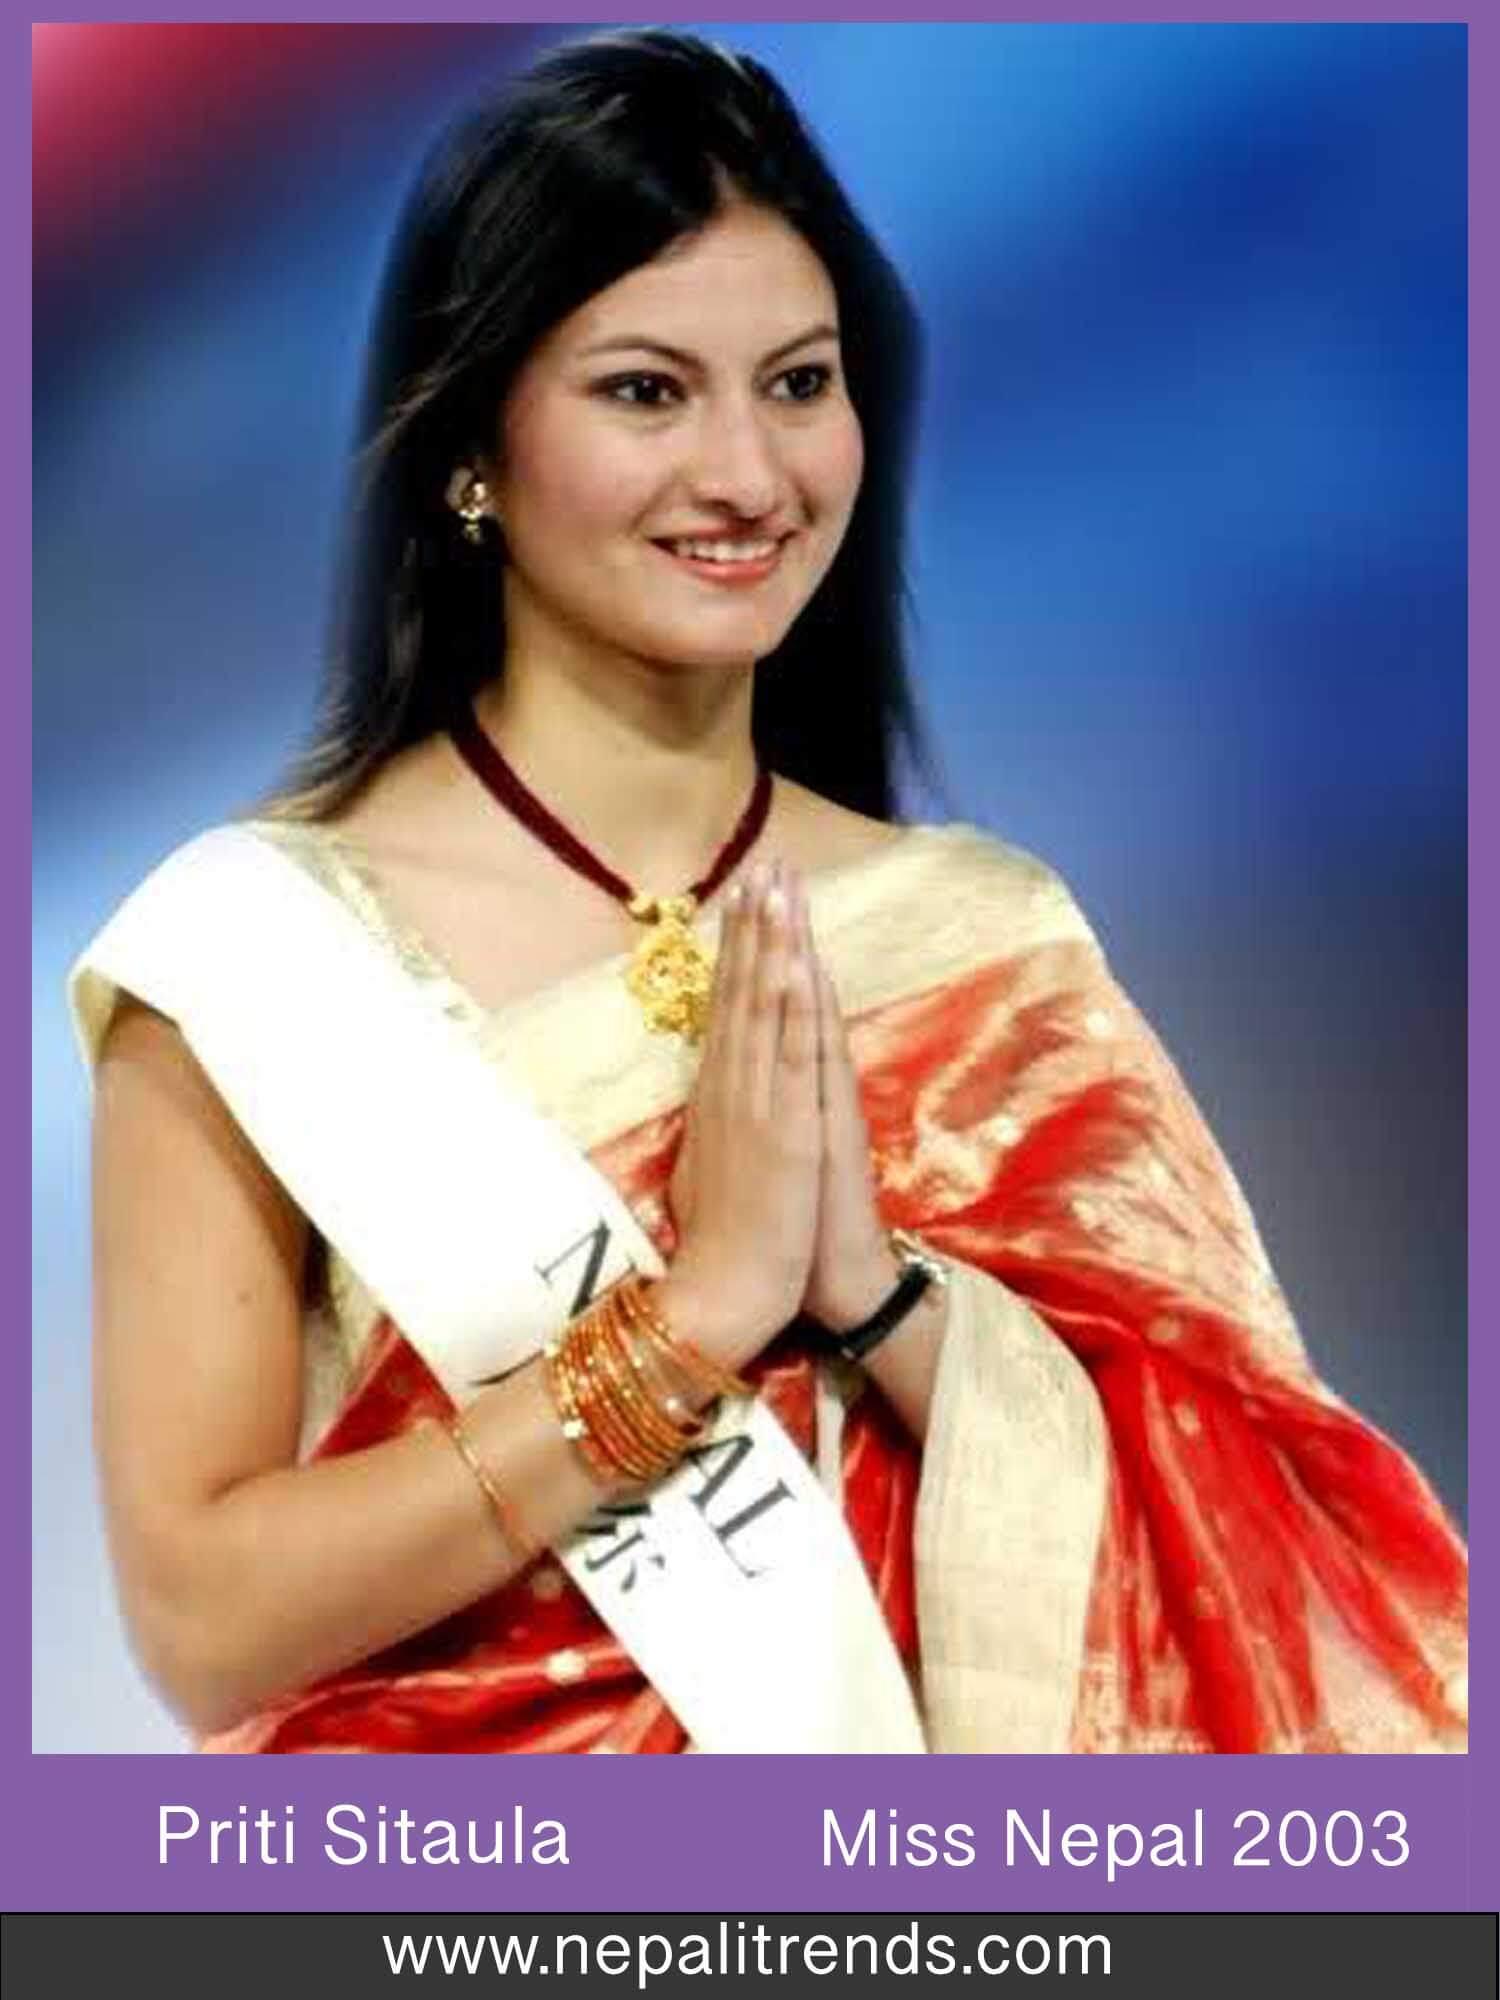 Priti Sitaula Miss Nepal 2003